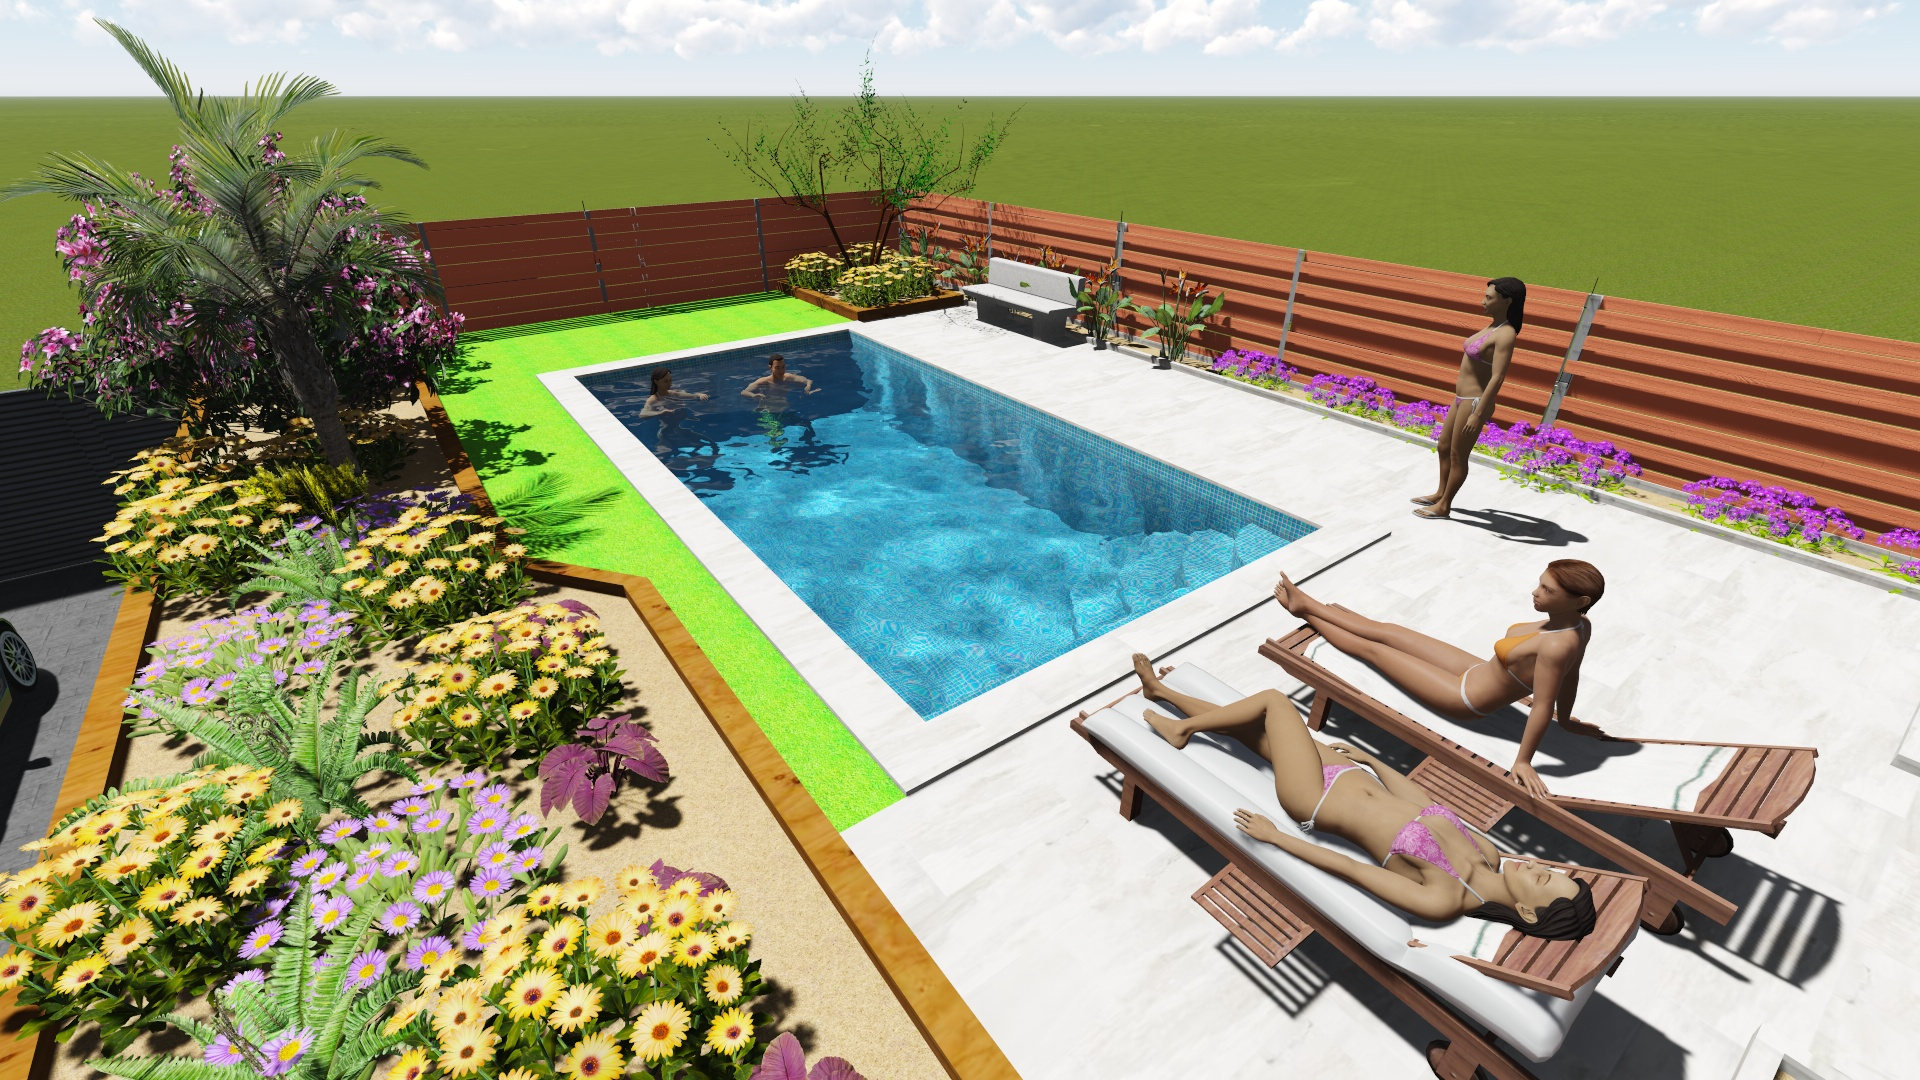 Construcci n de piscinas de obra - Piscinas pequenas de obra ...